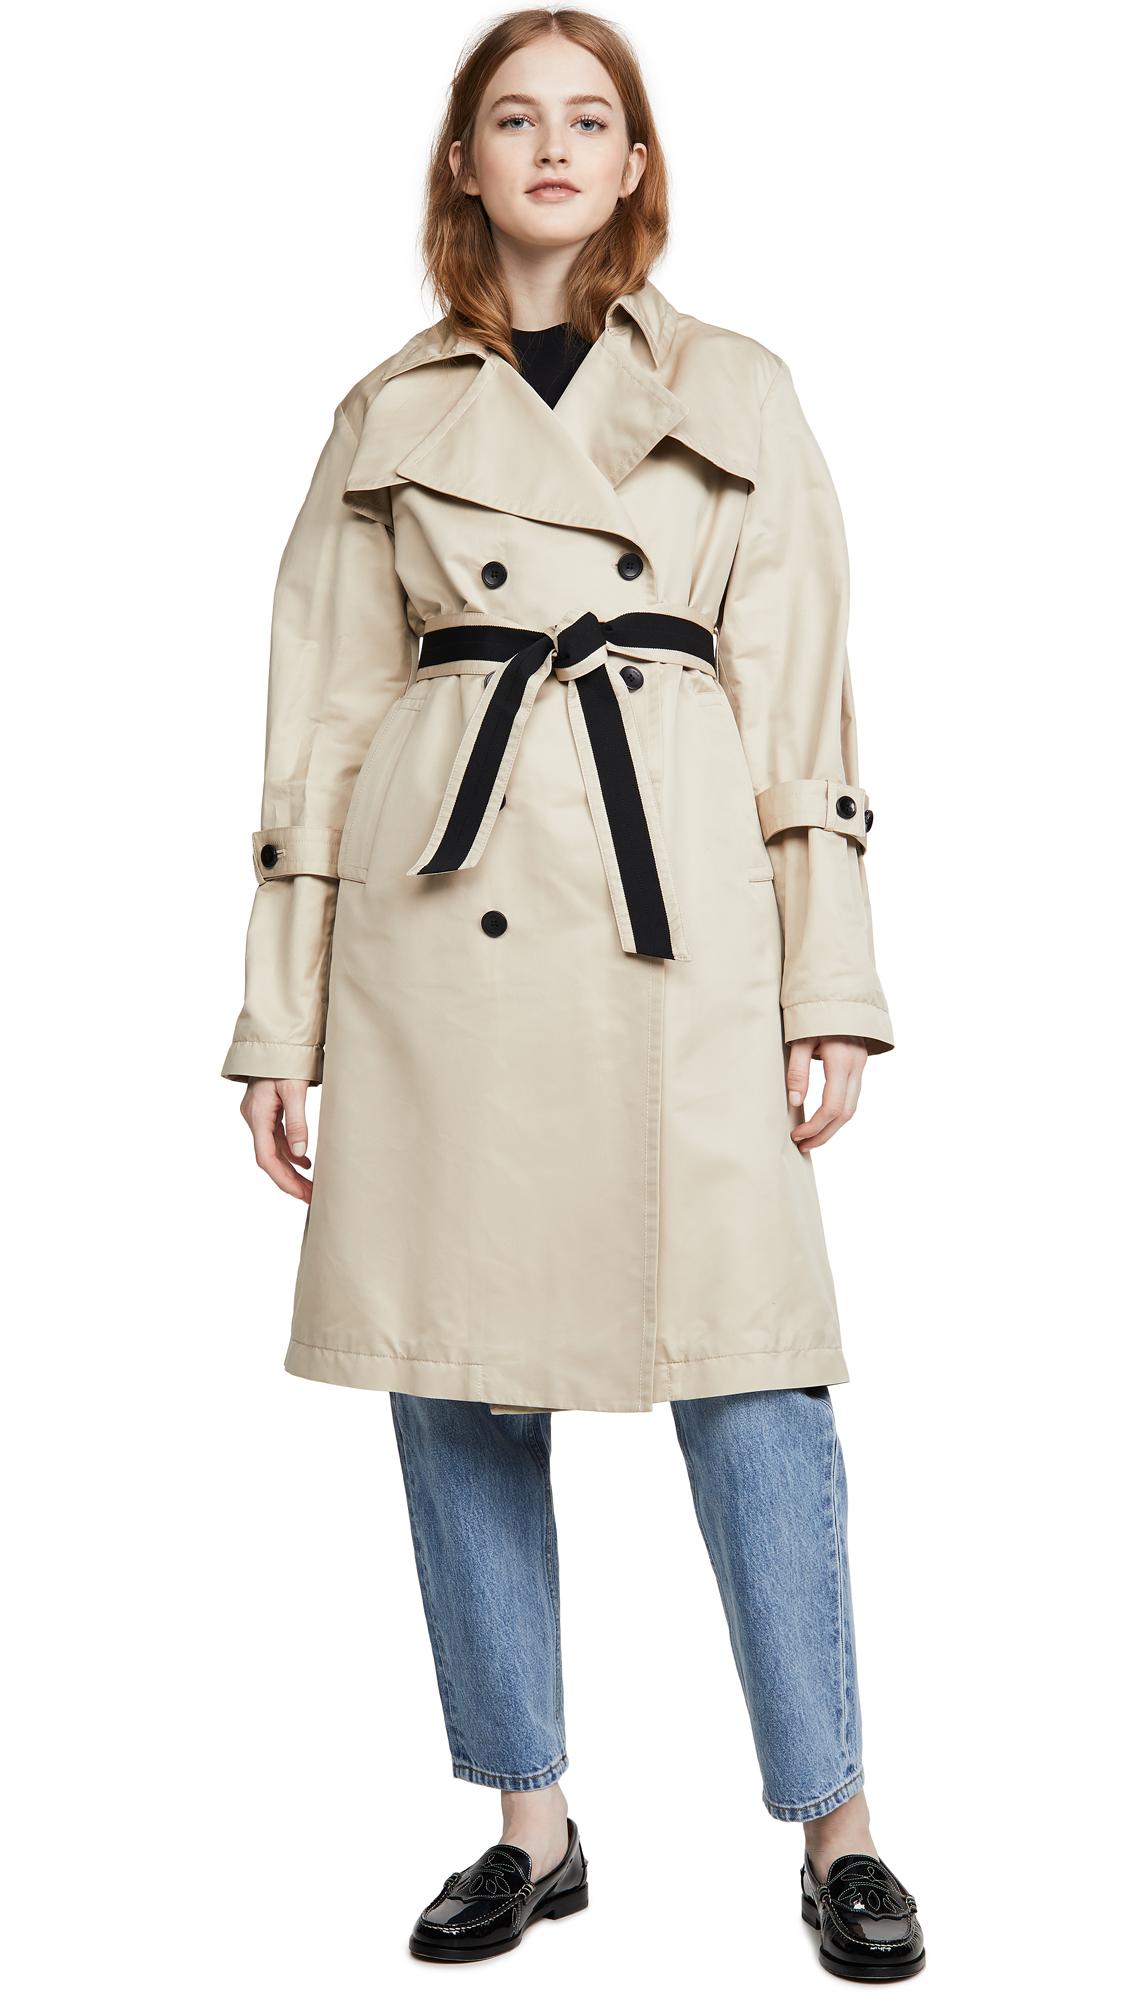 Buy Add Down Oversized Trench Coat online beautiful Add Down Jackets, Coats, Trench Coats